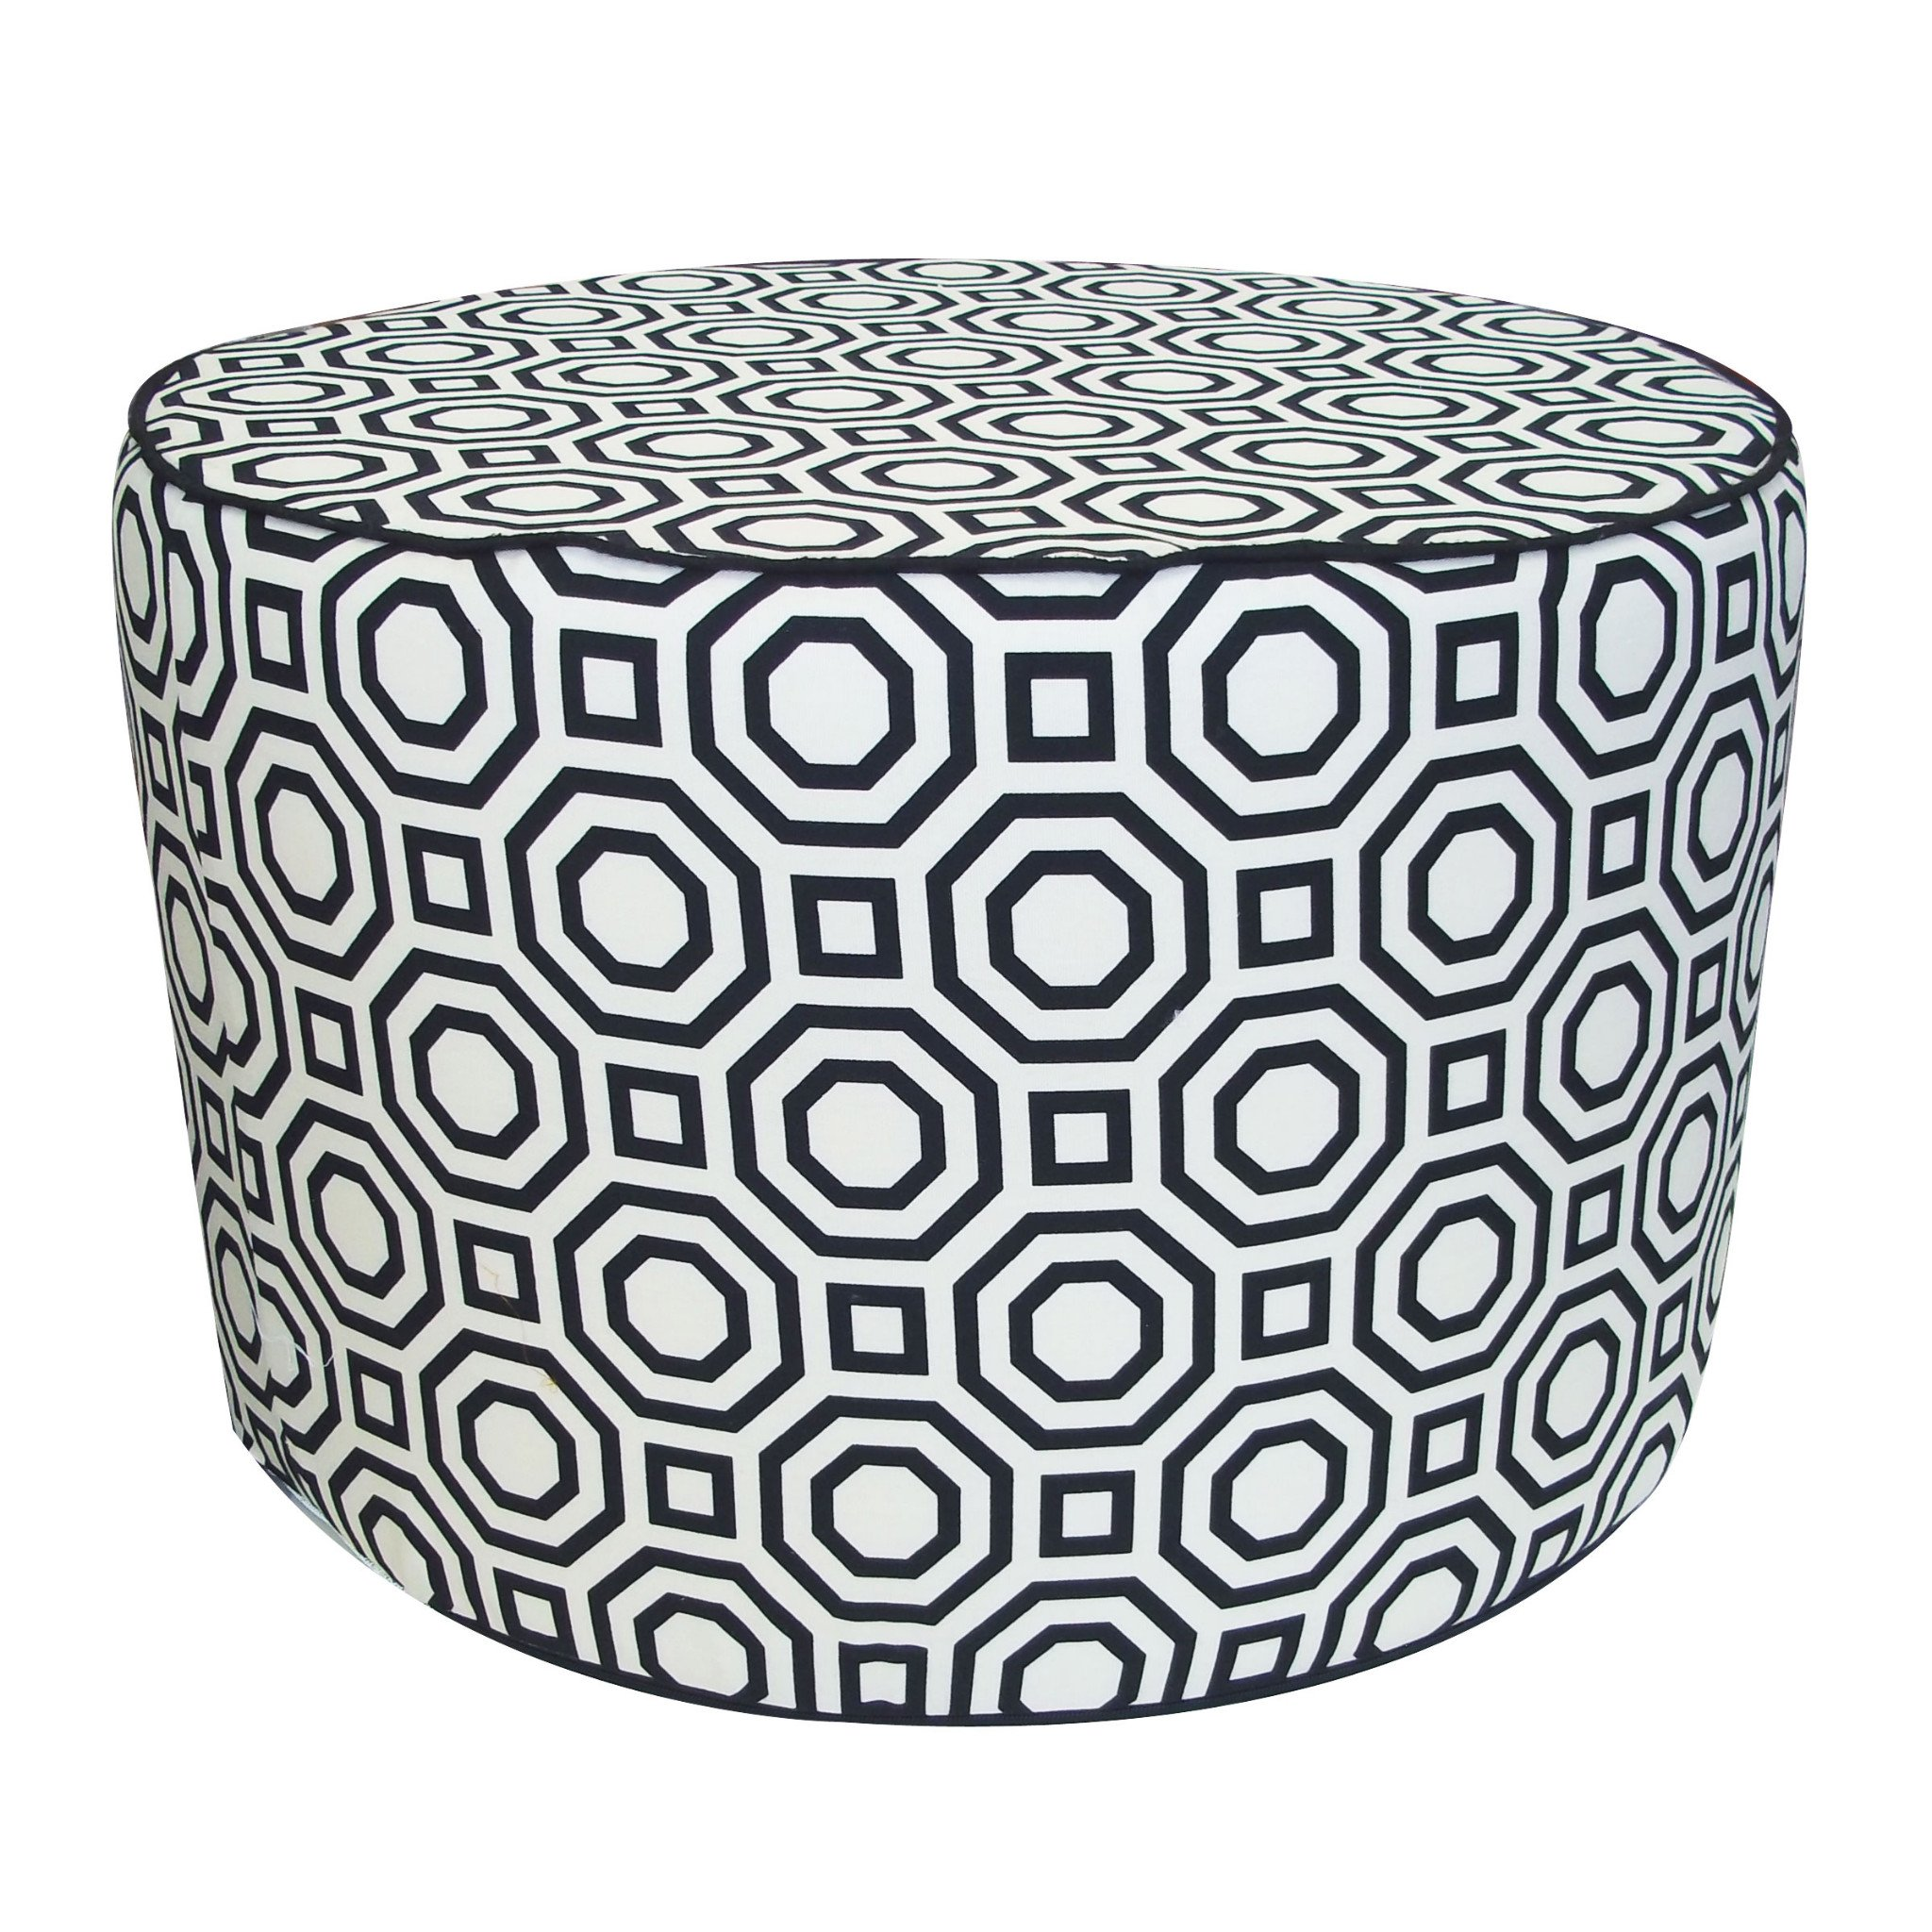 Jiti Labyrinth Round Pouf Cotton Ottoman, 24 by 24 by 15-Inch, White